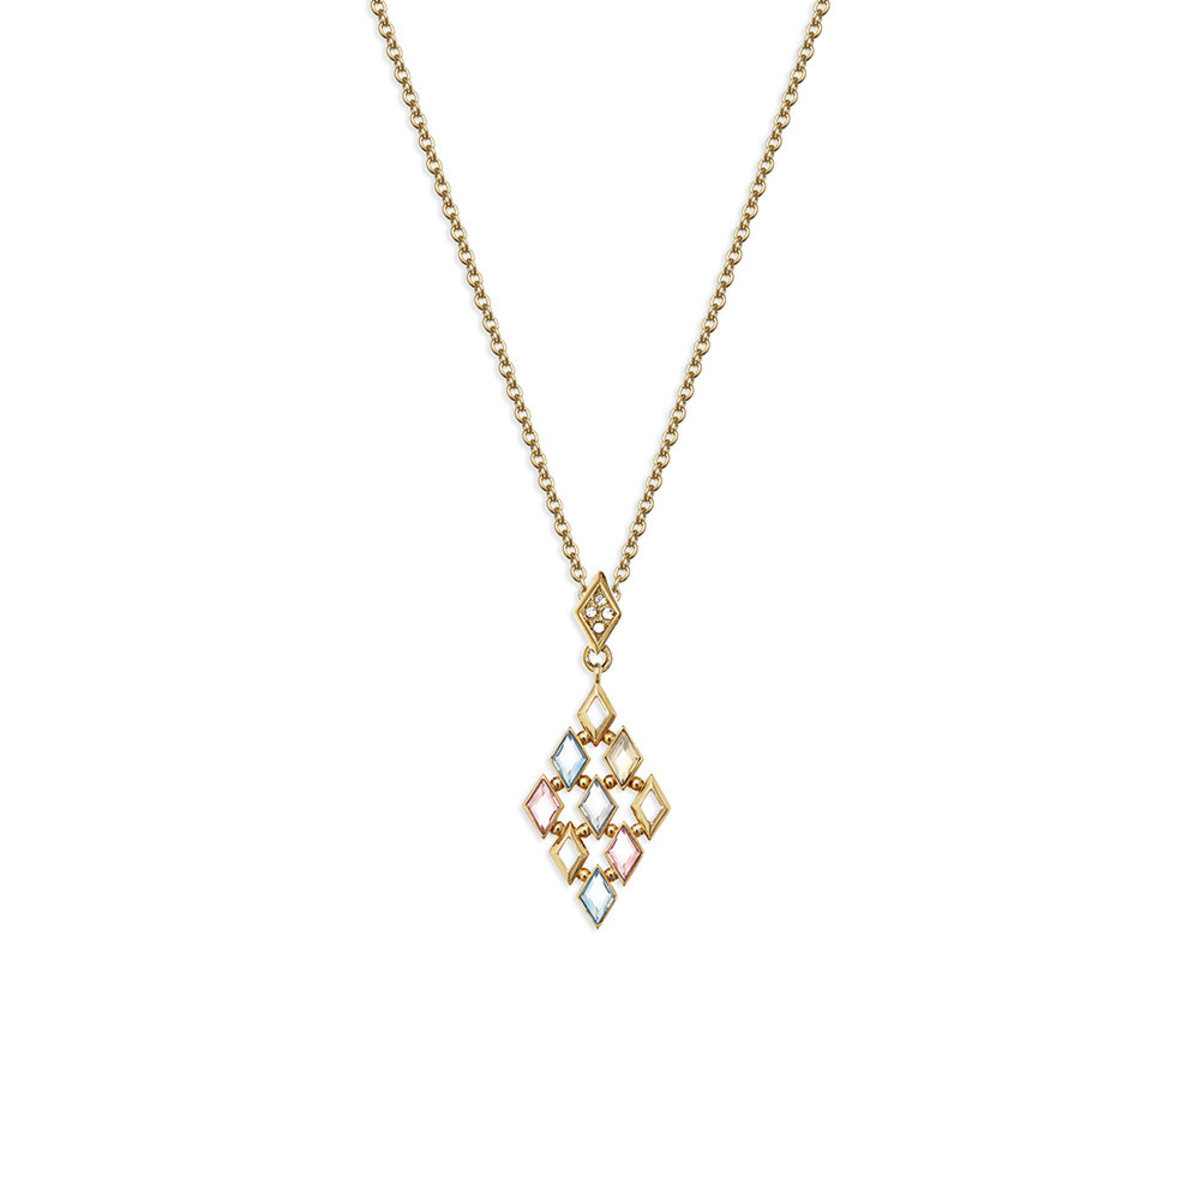 Glitter: gold plating, multi-coloured Swarovski crystal necklace